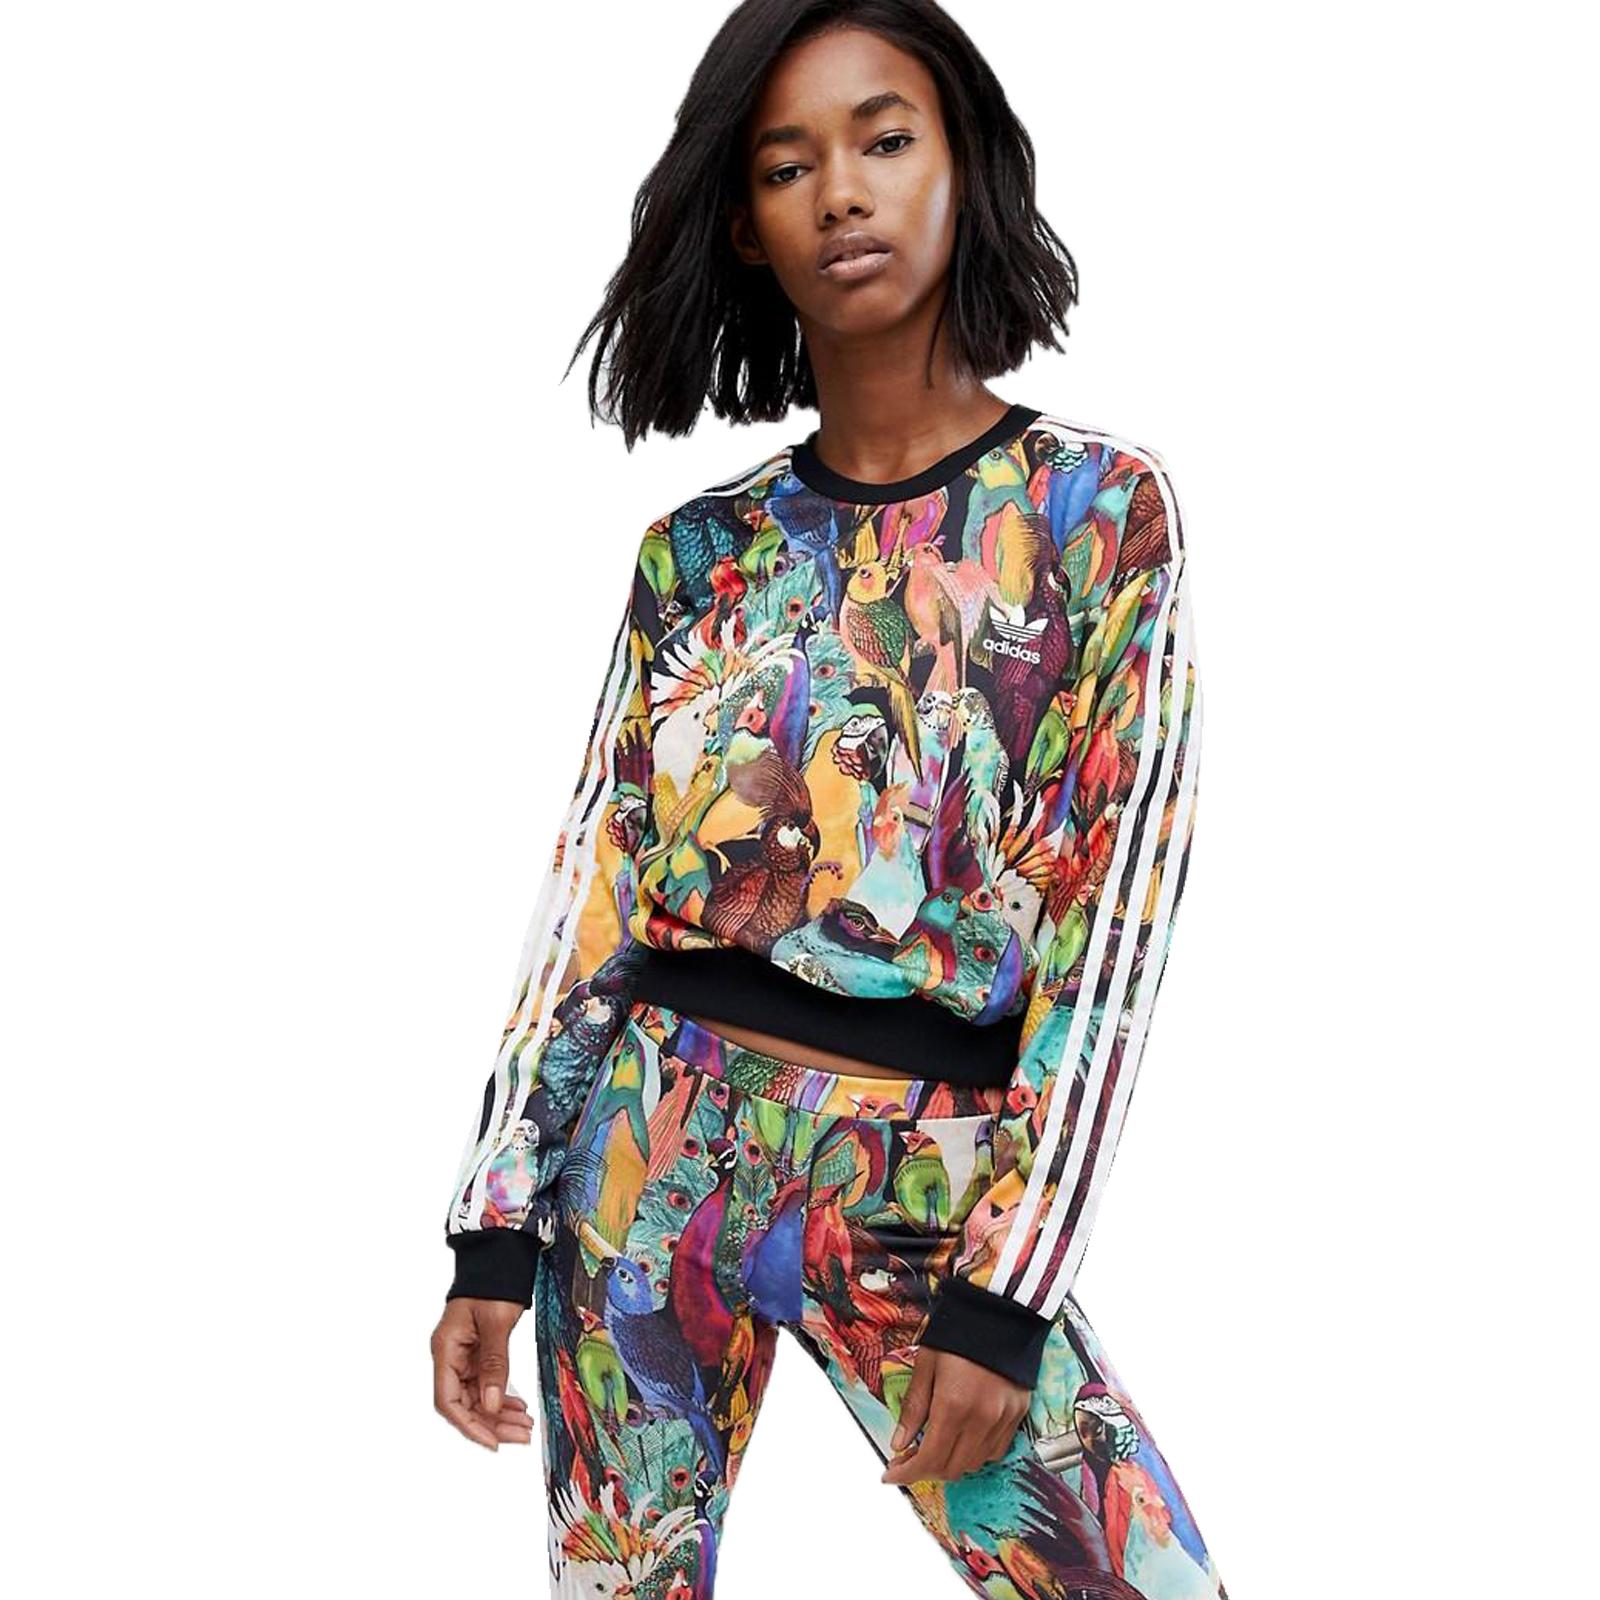 Details zu adidas Originals The Farm Company Passaredo Crop Sweatshirt kurzer Pulli Kakadu